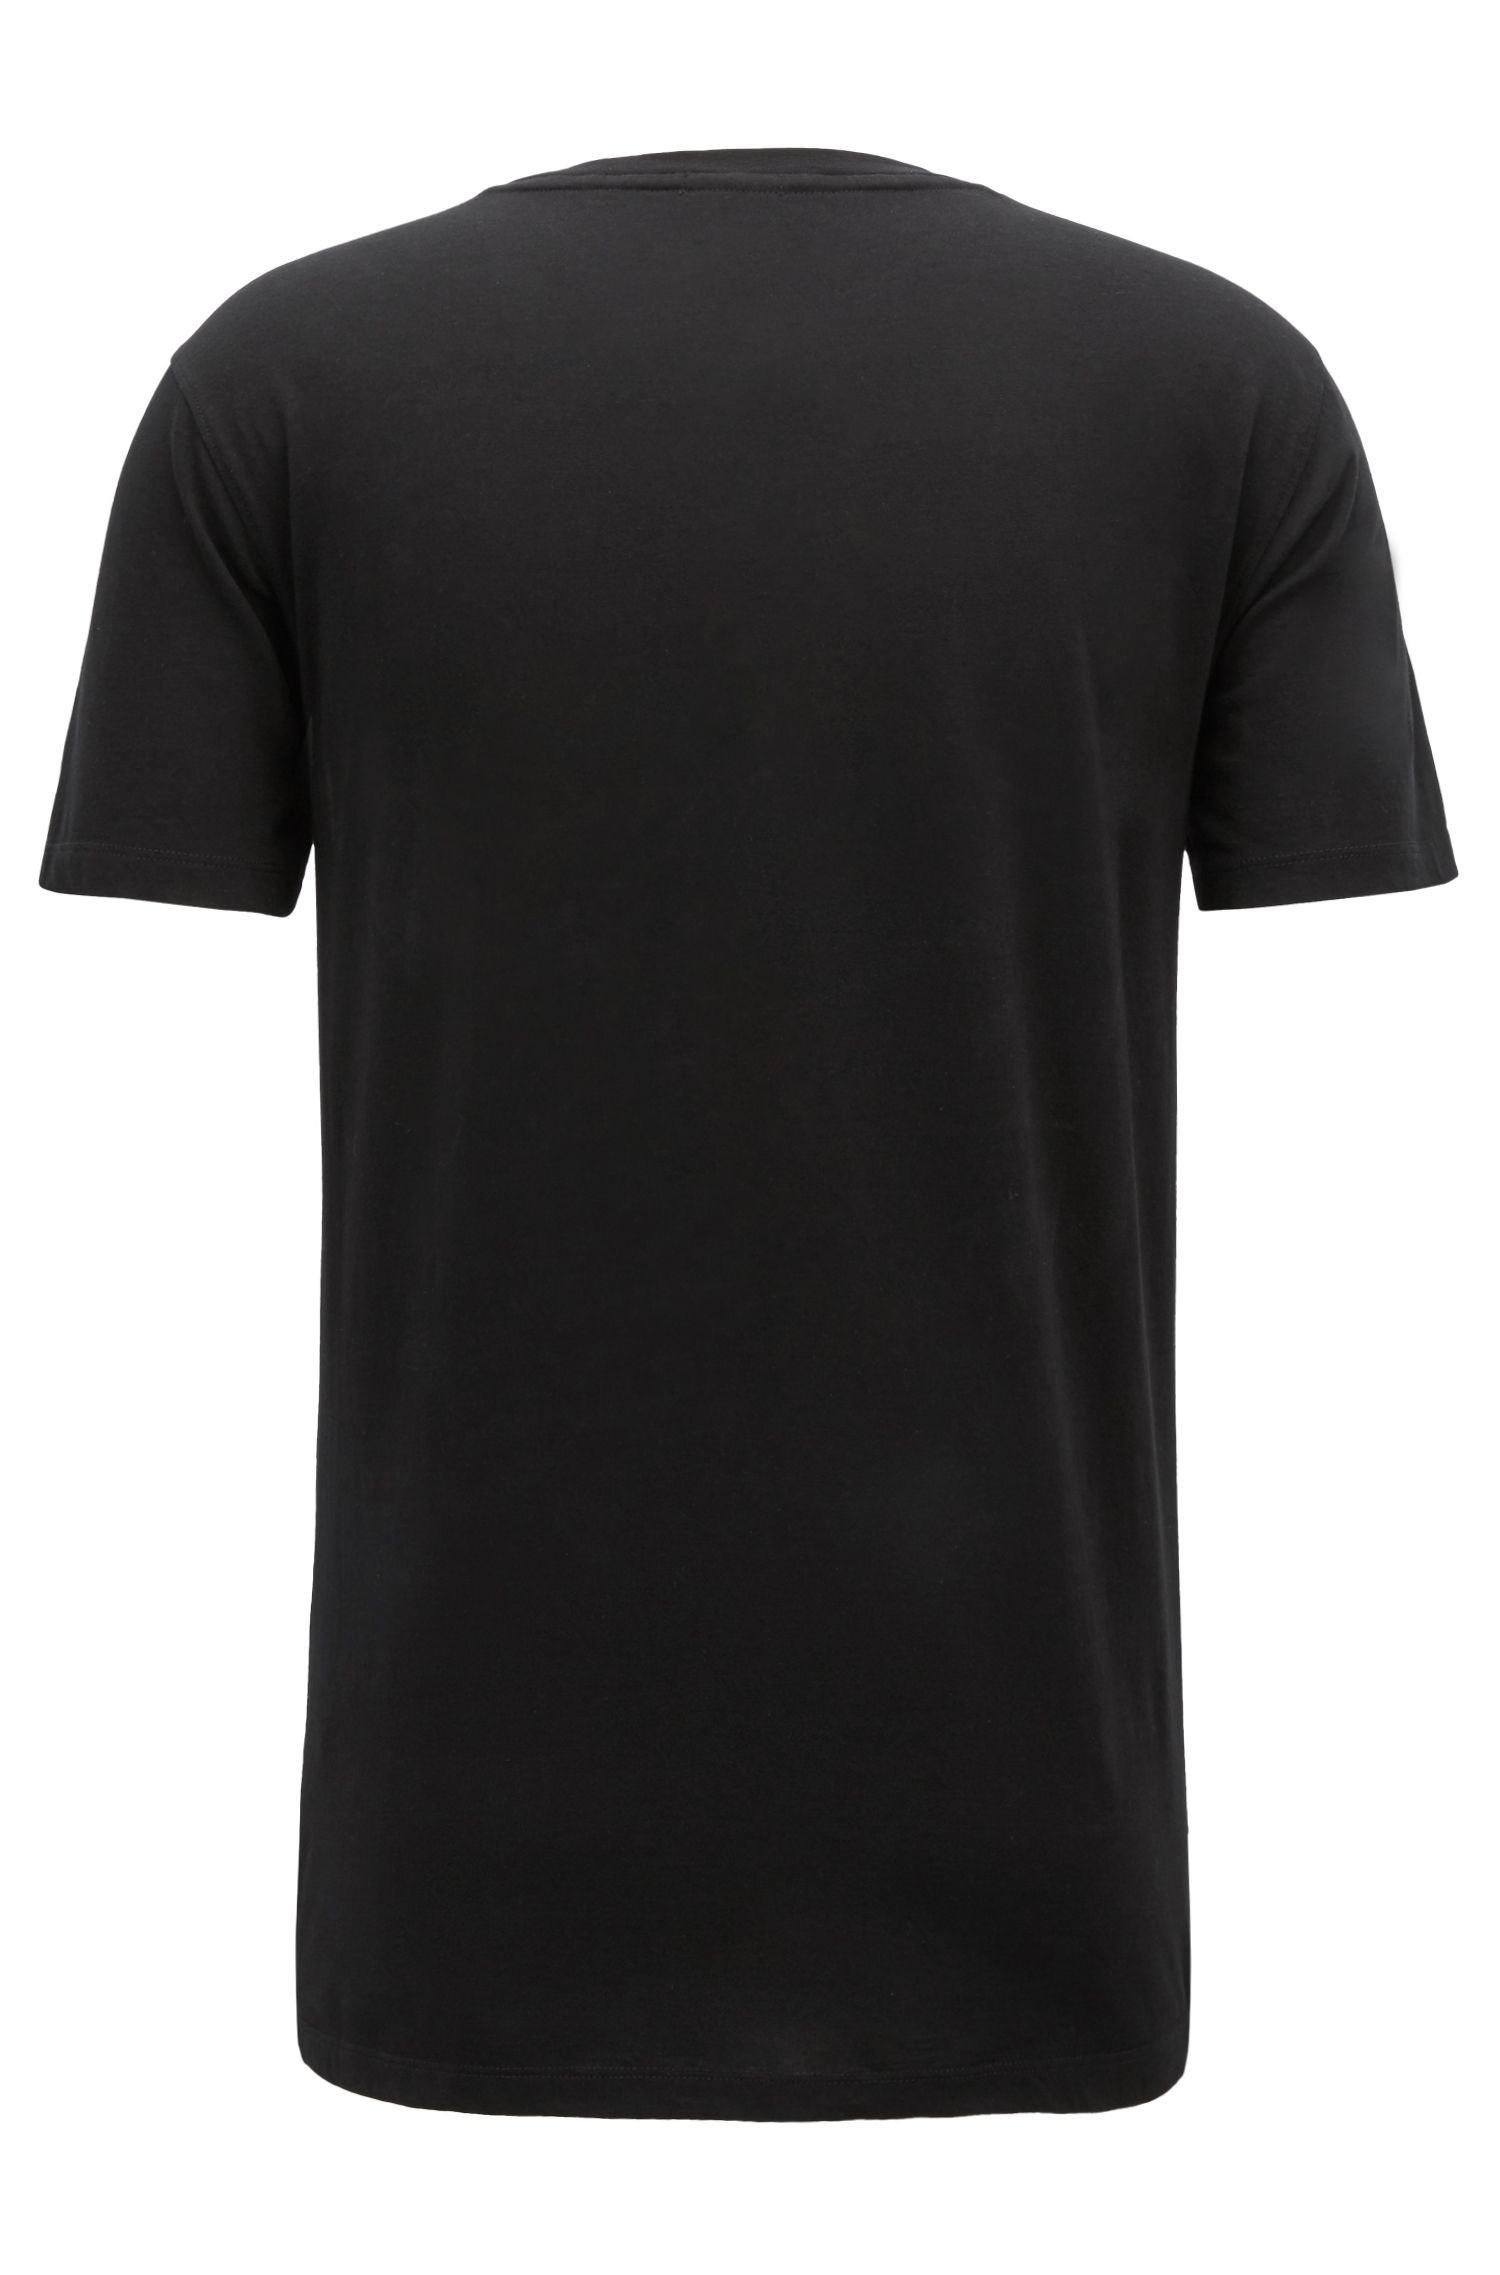 Digitally printed T-shirt in Pima cotton, Black